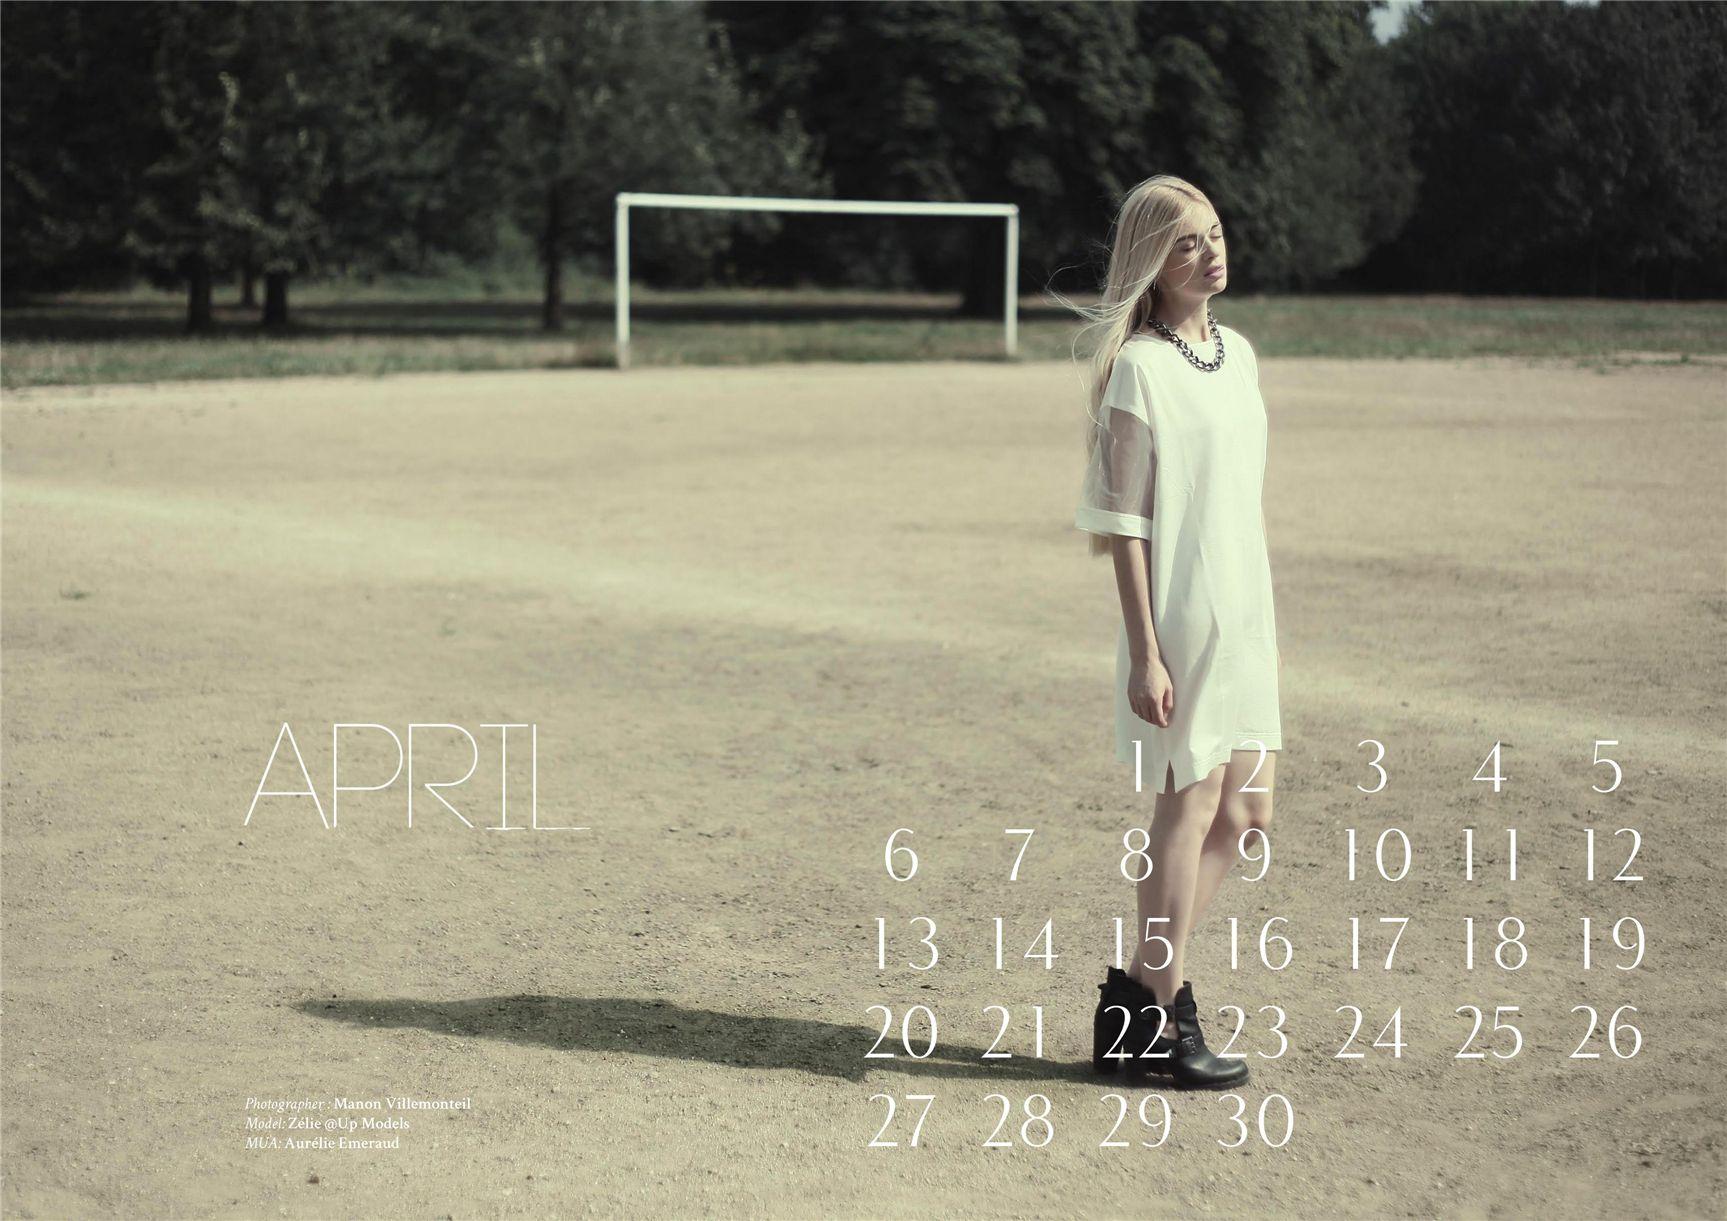 модно-артистический календарь журнала Bizart 2015 calendar - Zelie by Manon Villemonteil